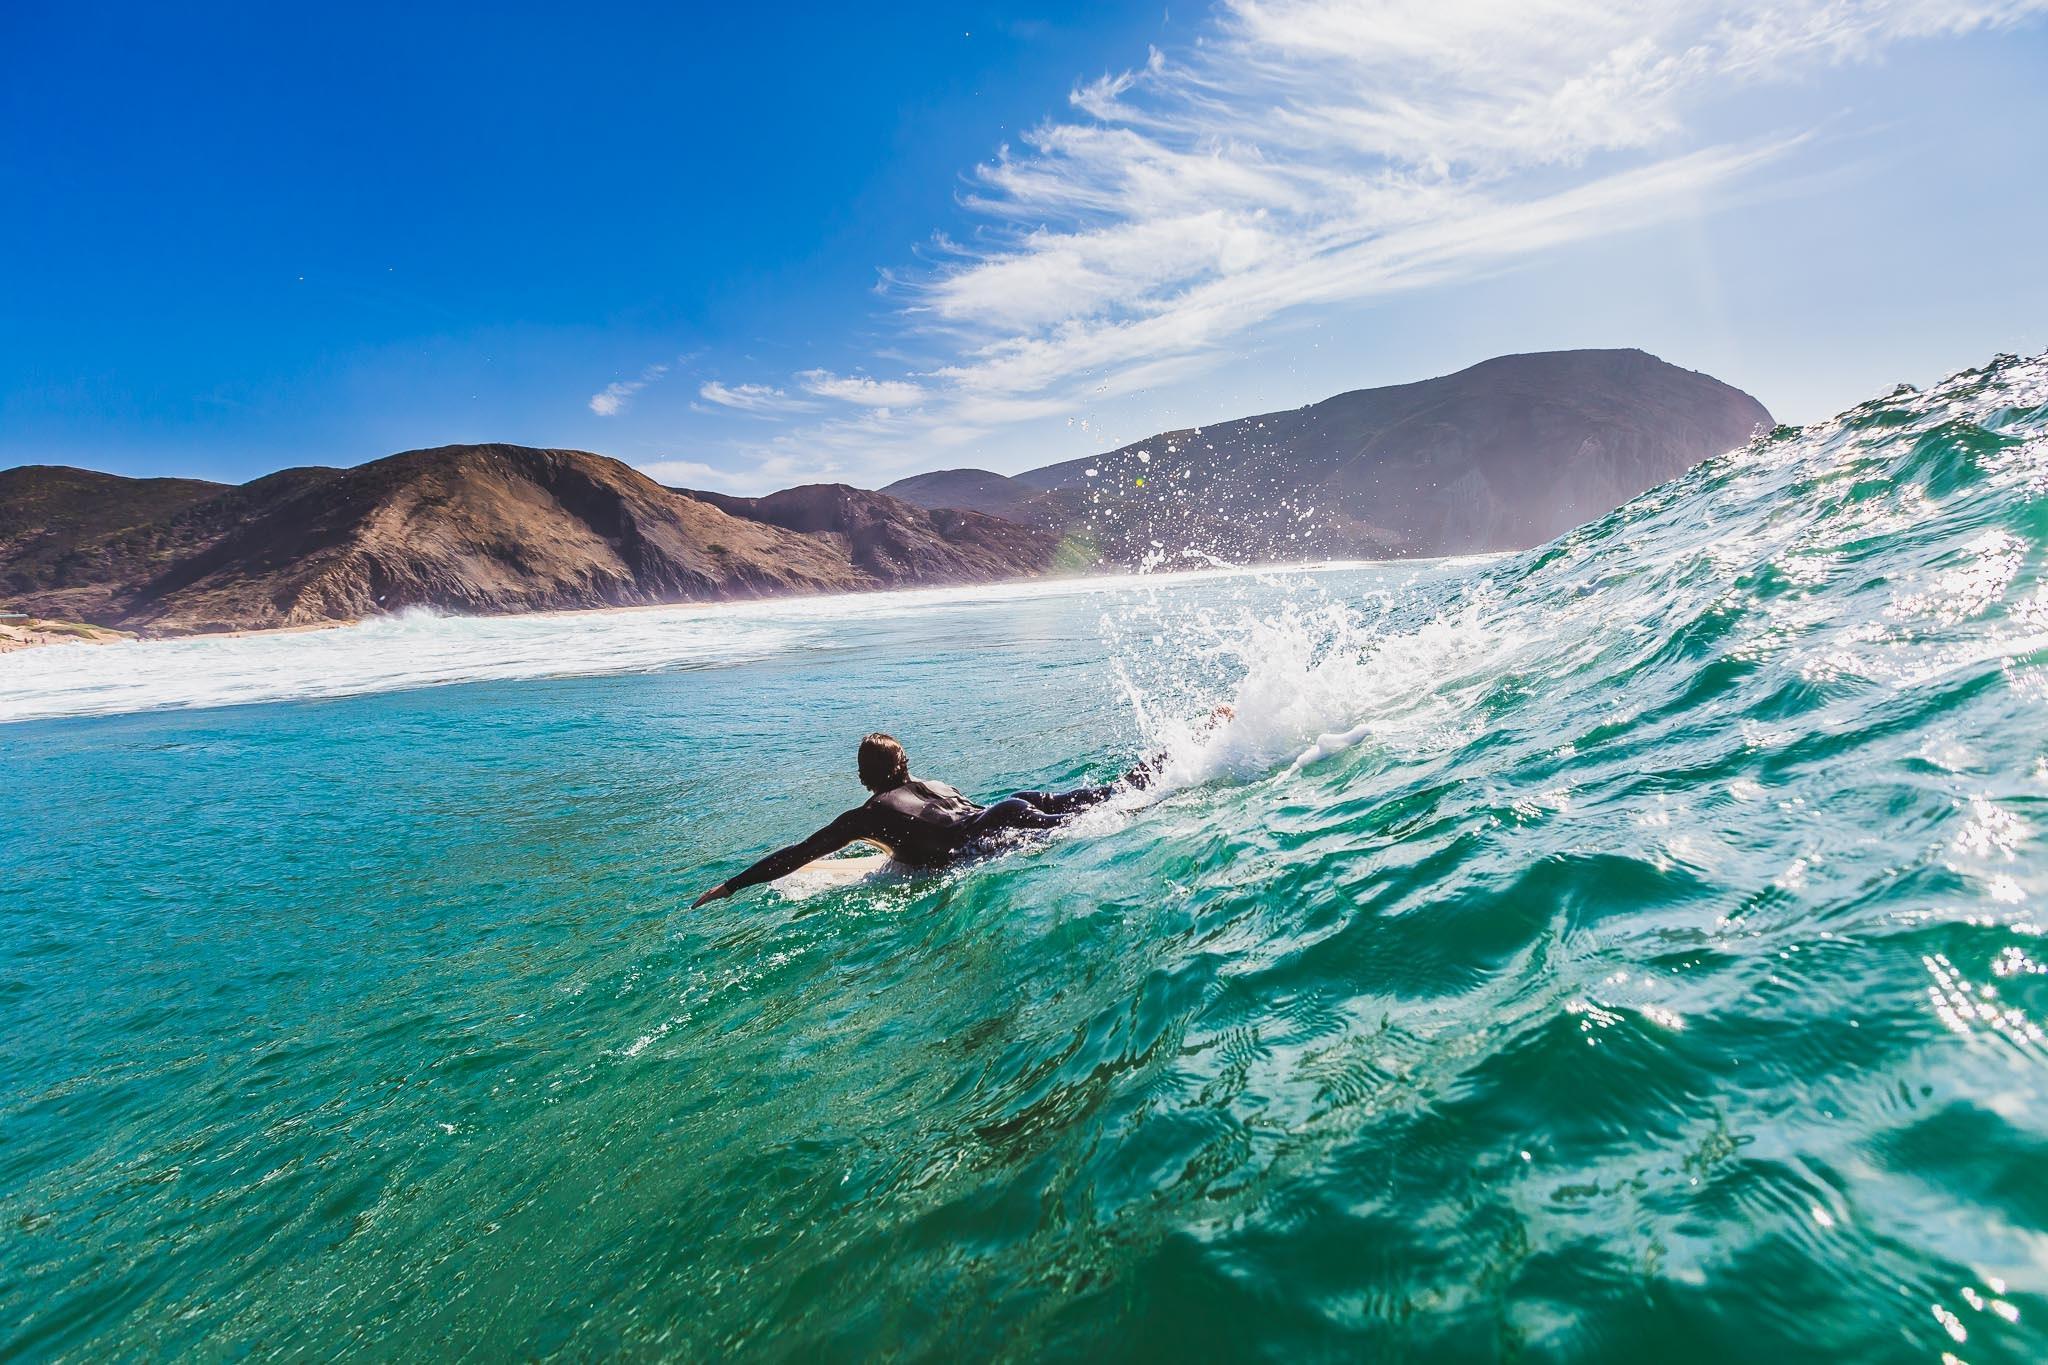 5 Of The Best Surf Spots In Portugal. Surfing Spots. // WarmRental